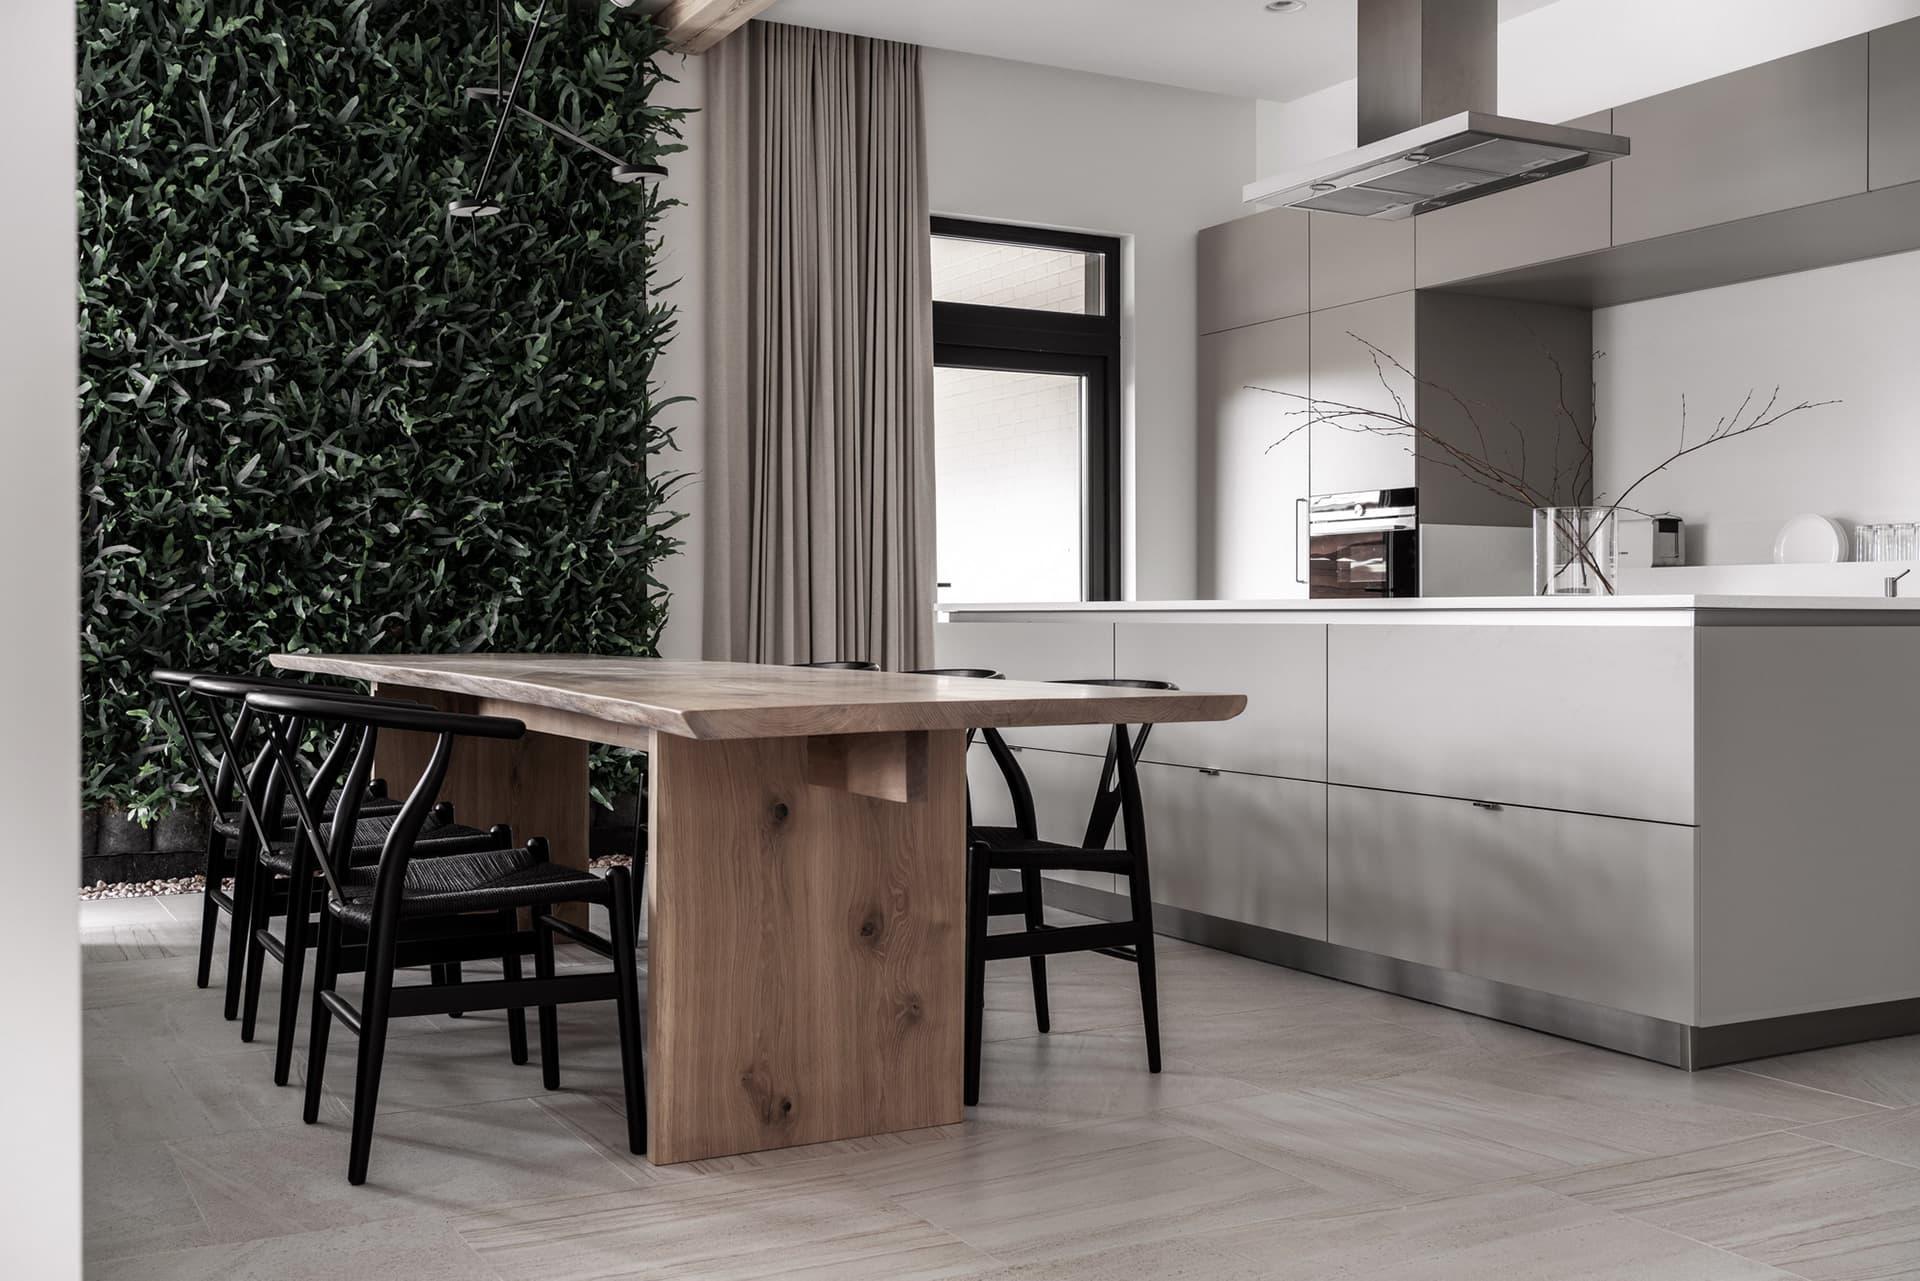 kitchen in minimalist interior style